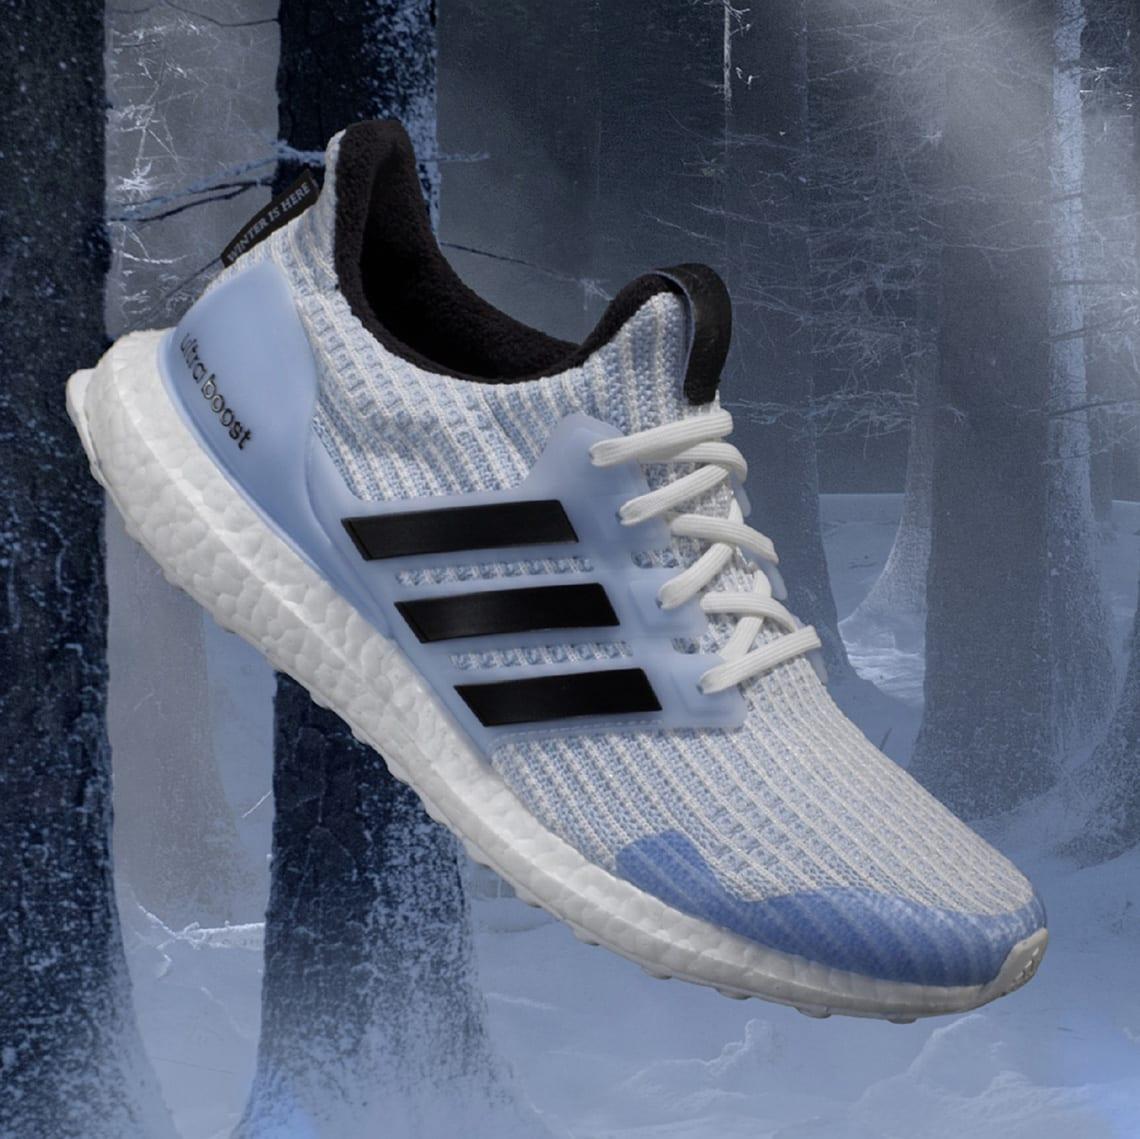 Calendar Adidas Release Dates Adidas Dates Dates Calendar Adidas Release Release gbf7yvIY6